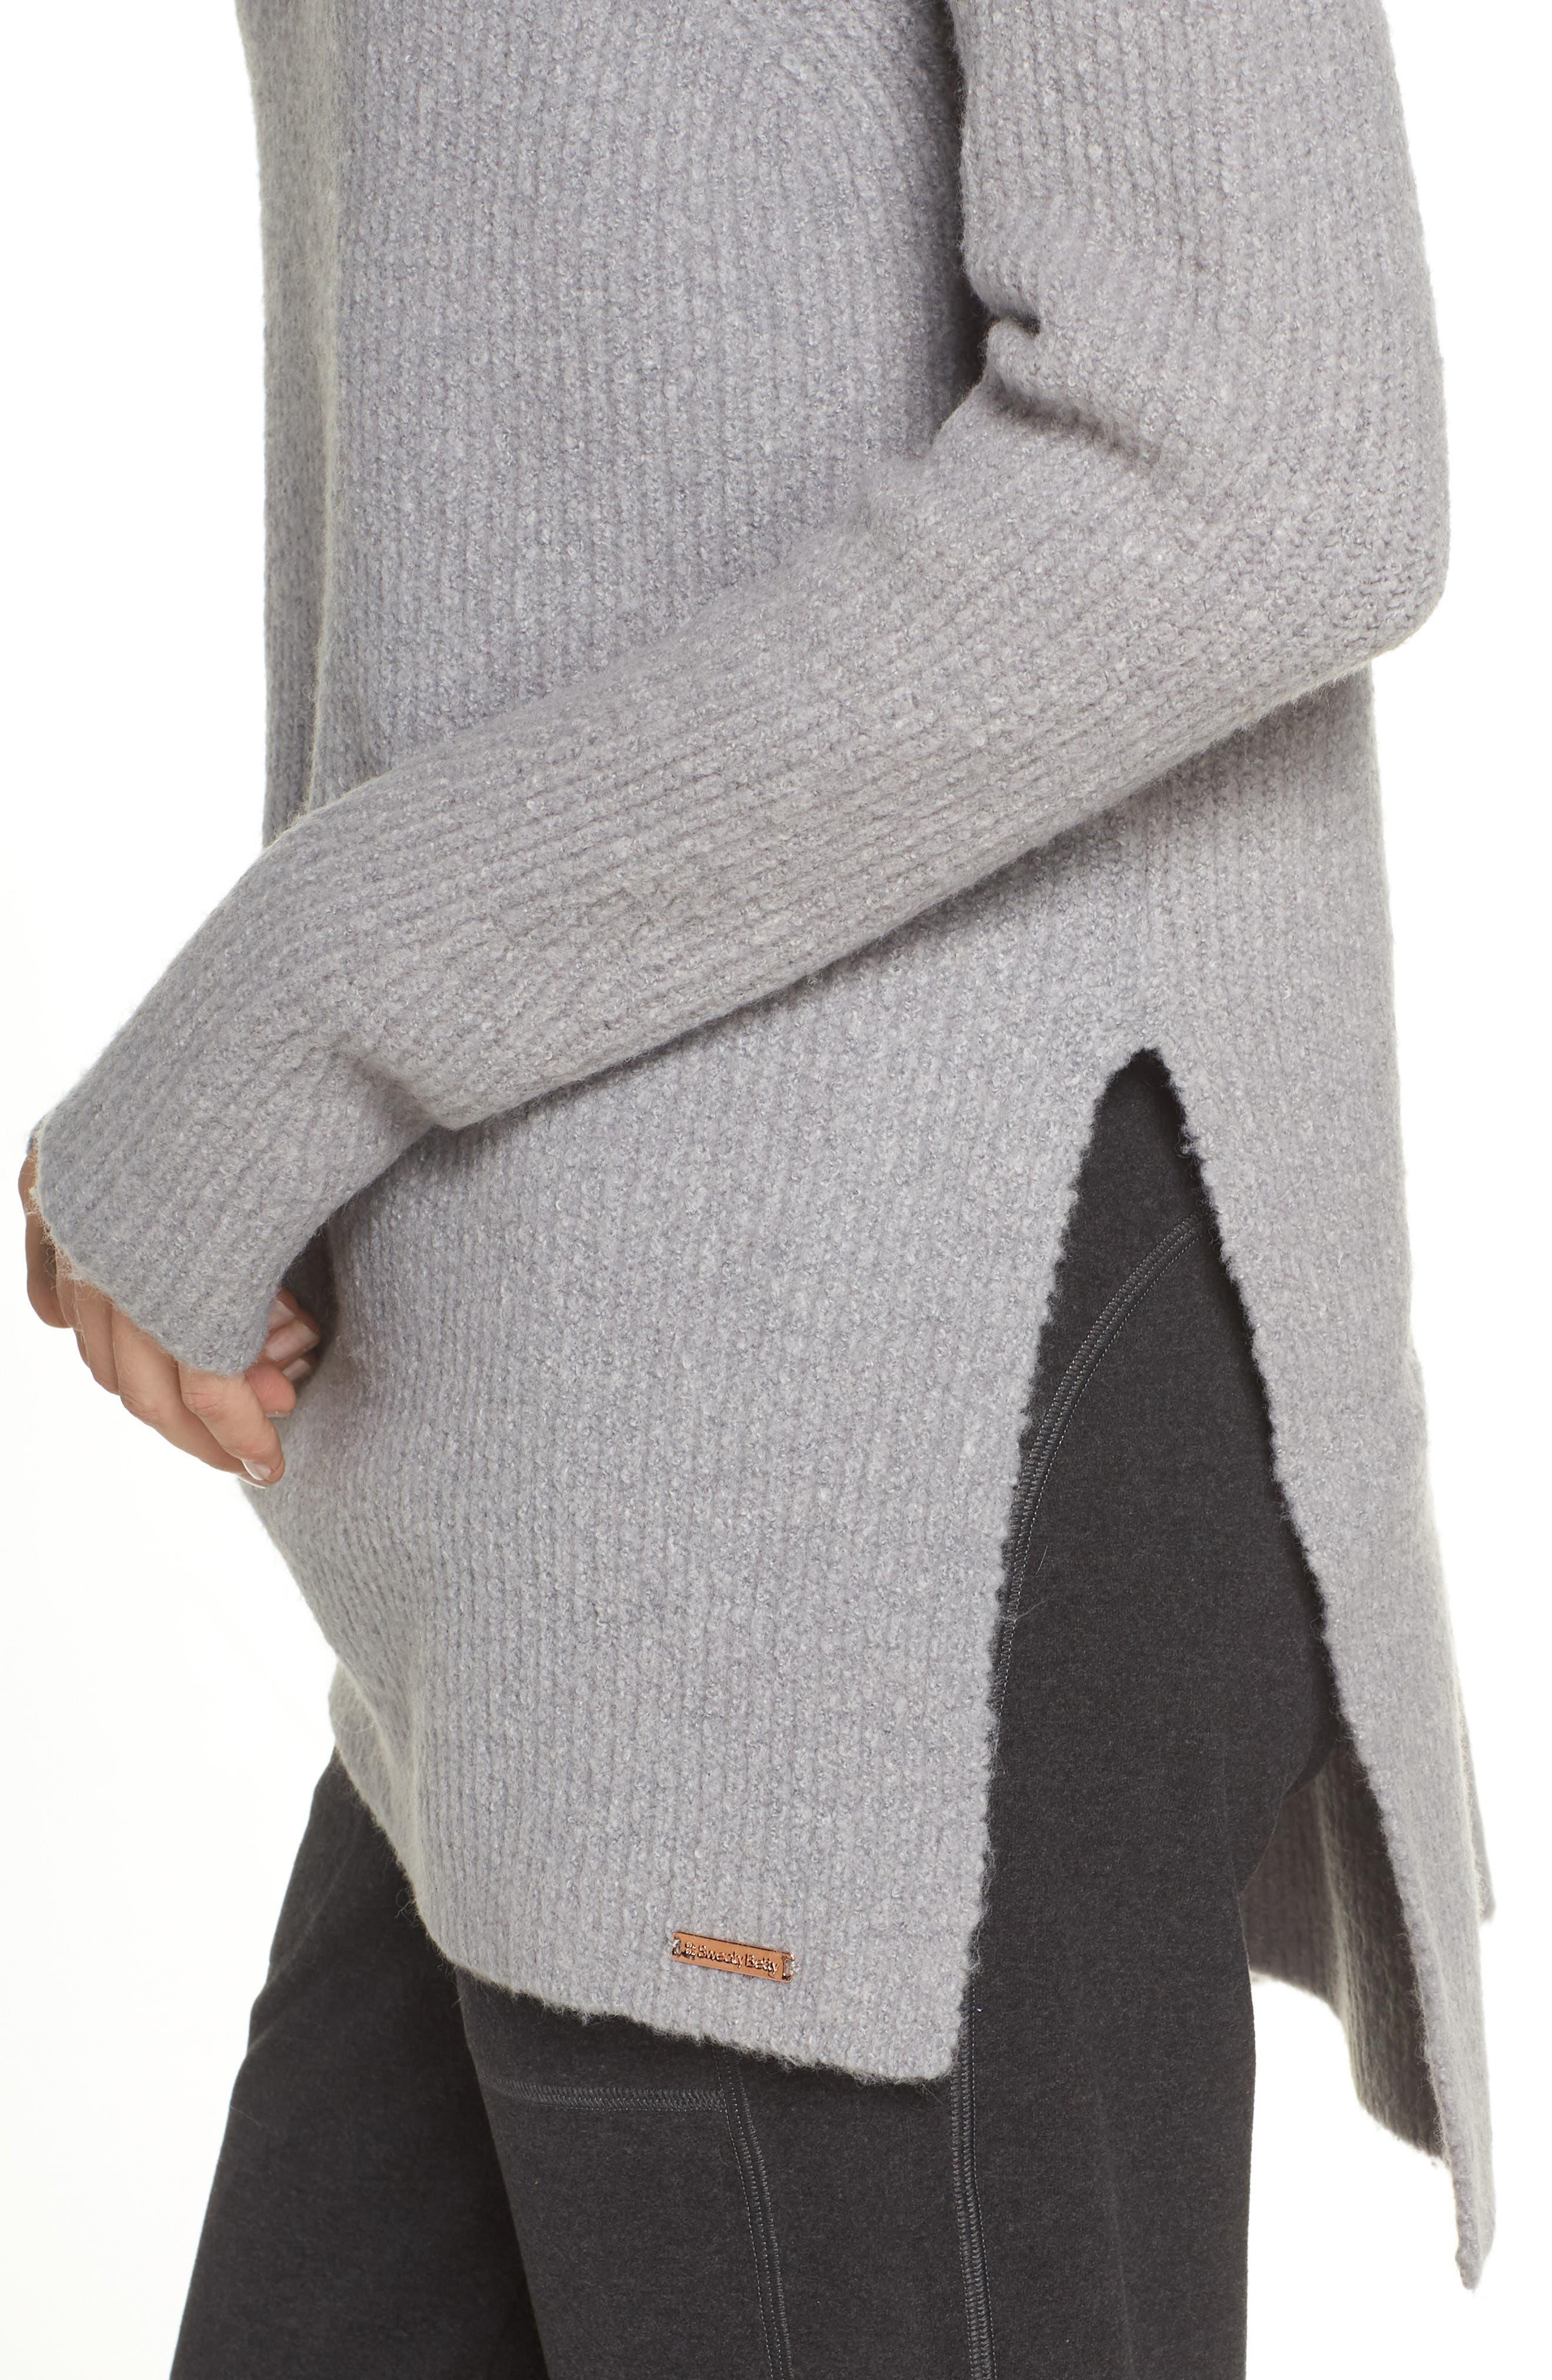 SWEATY BETTY,                             Shakti Oversize Sweater,                             Alternate thumbnail 4, color,                             023